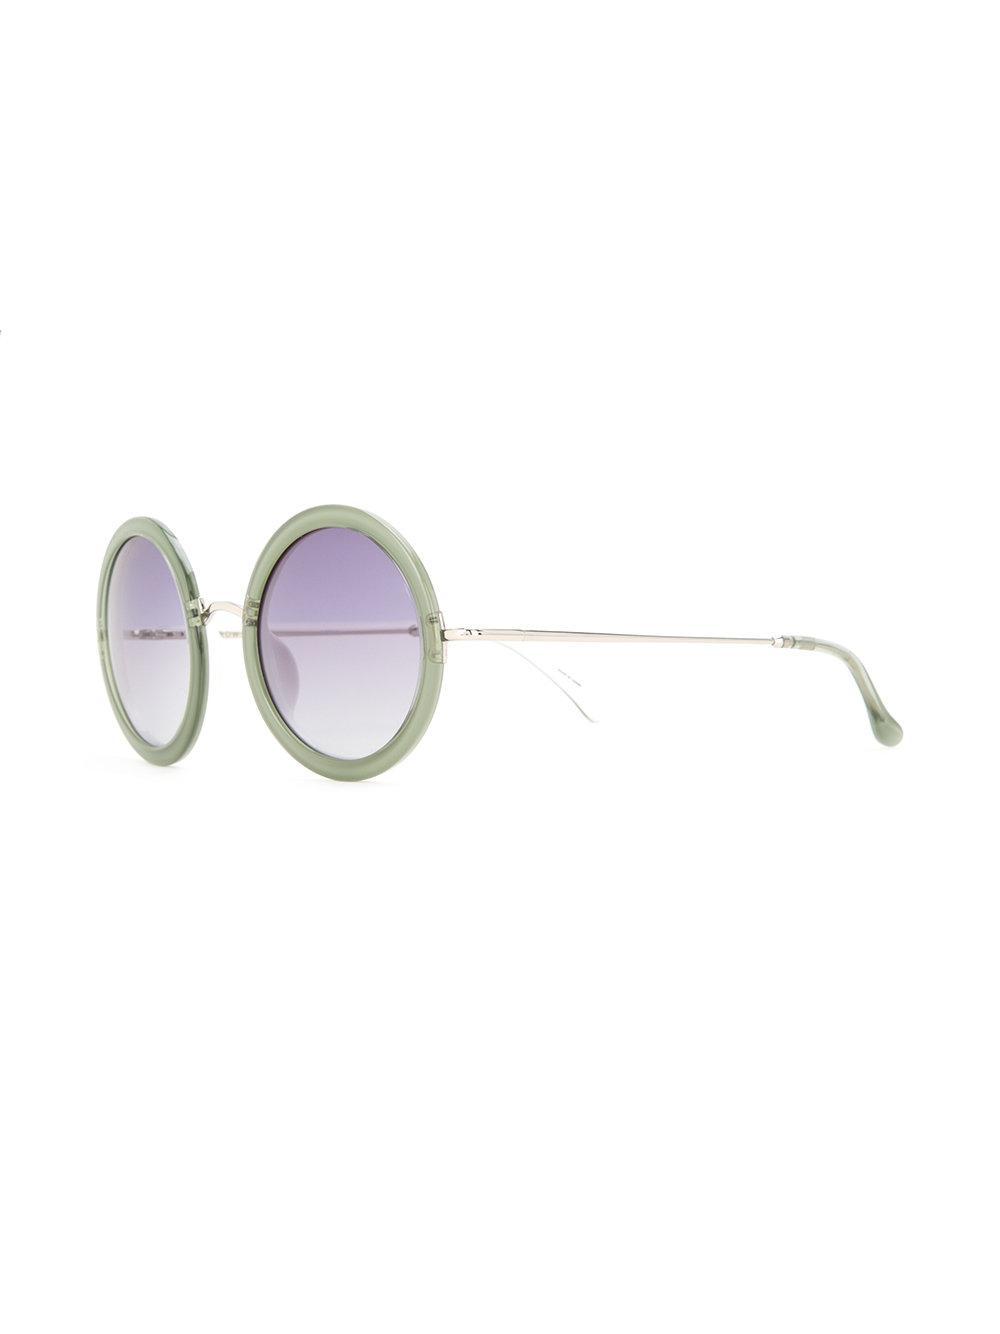 ad21257e9777 Linda Farrow The Row 8 Sunglasses in Green - Lyst